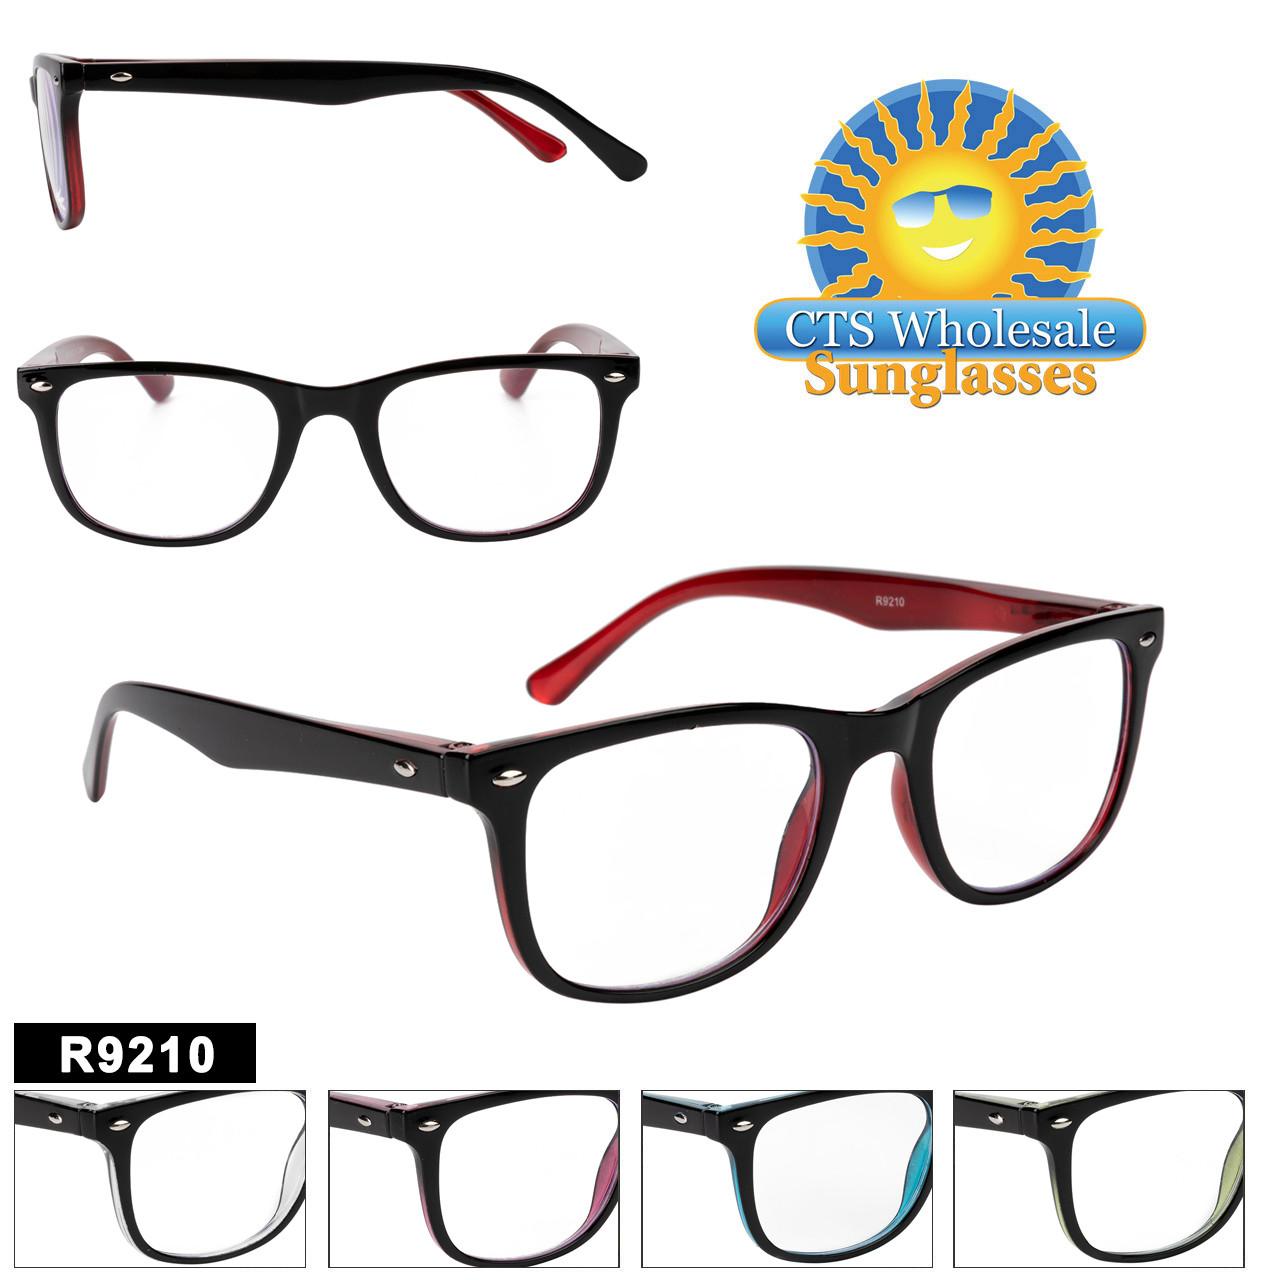 Reading Glasses in Bulk - R9210(12 pcs.) Assorted Colors ~ Lens Strengths +1.00—+3.50